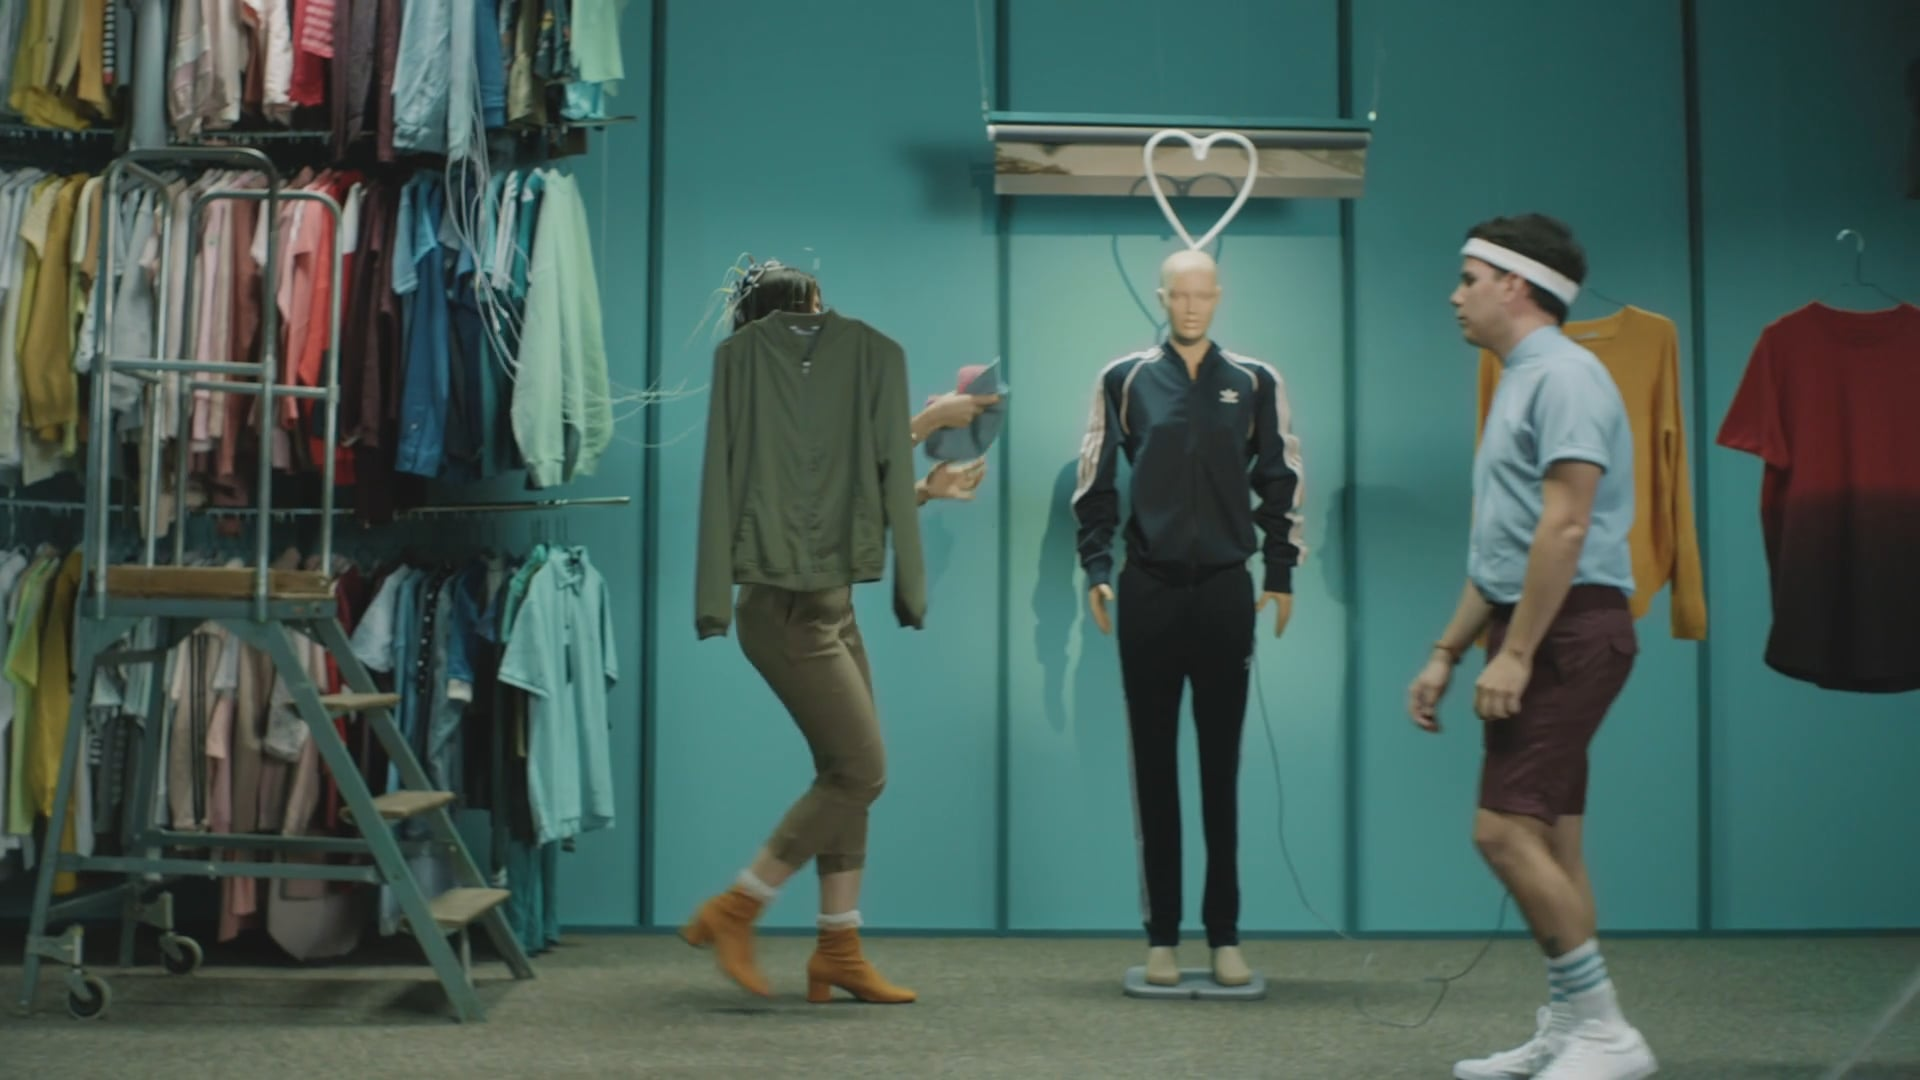 SHOOTINGMONKEYS | ZALANDO - Fashion Reco